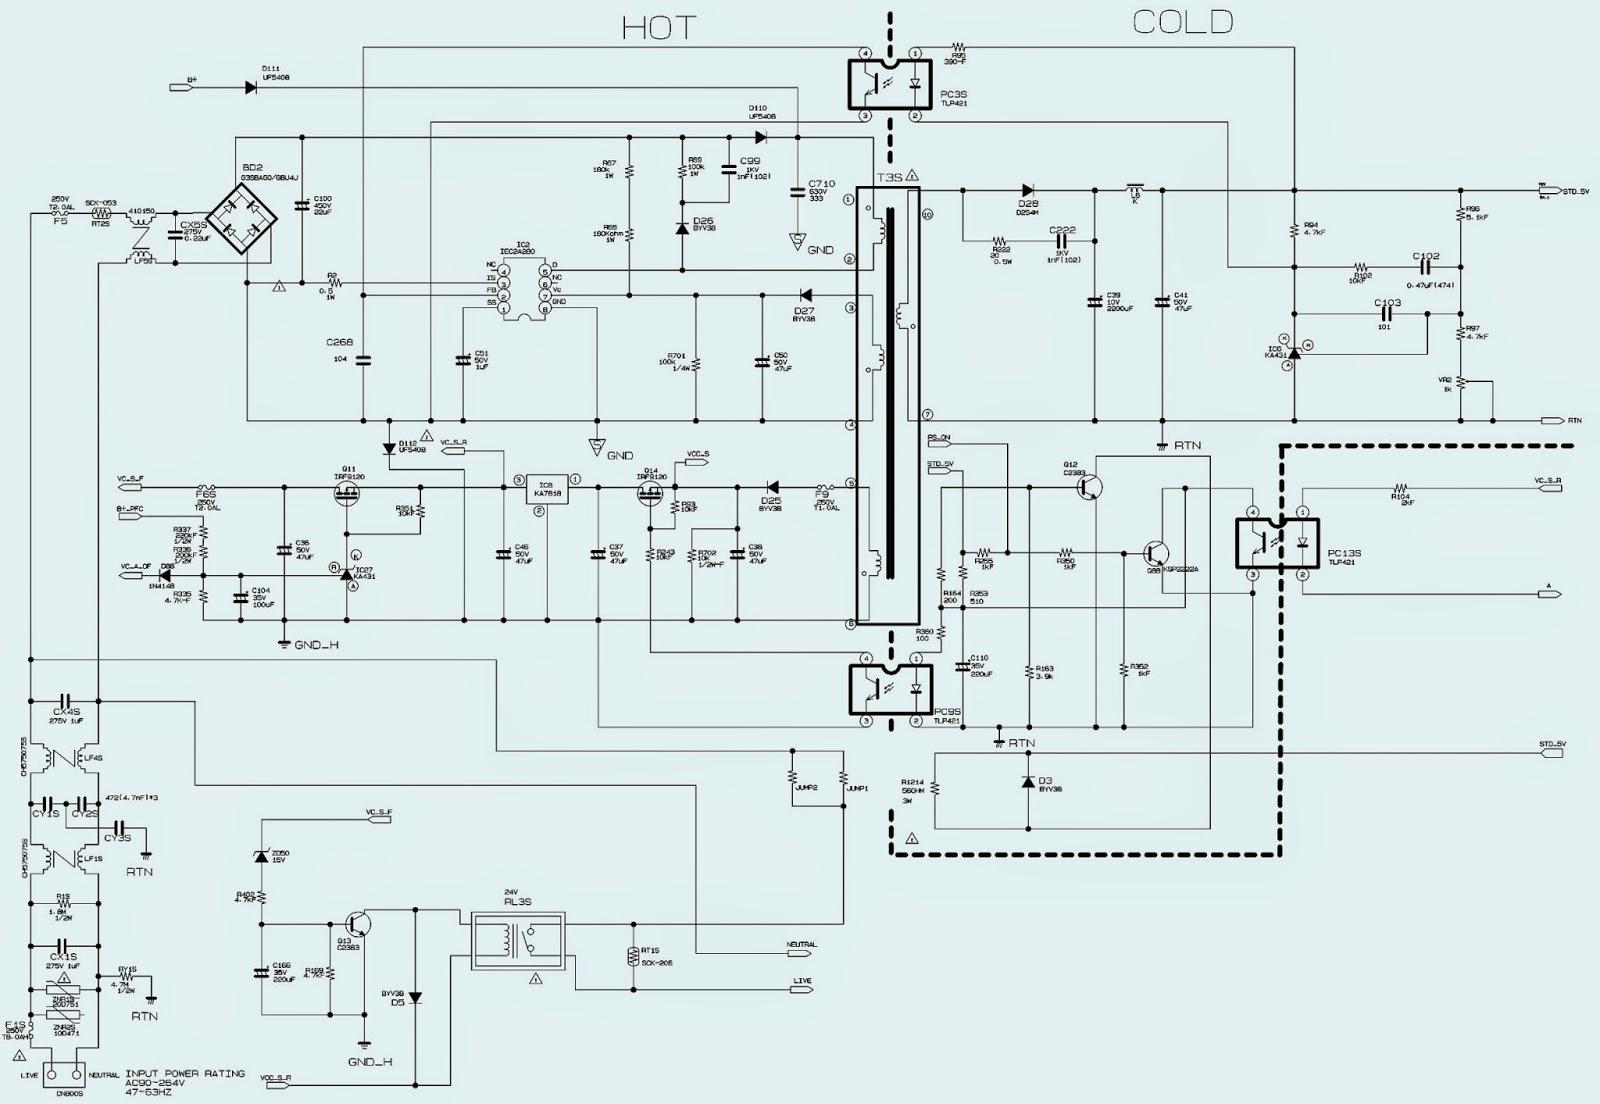 medium resolution of bn 96 samsung power supply schematic circuit diagram electro help samsung lcd tv power